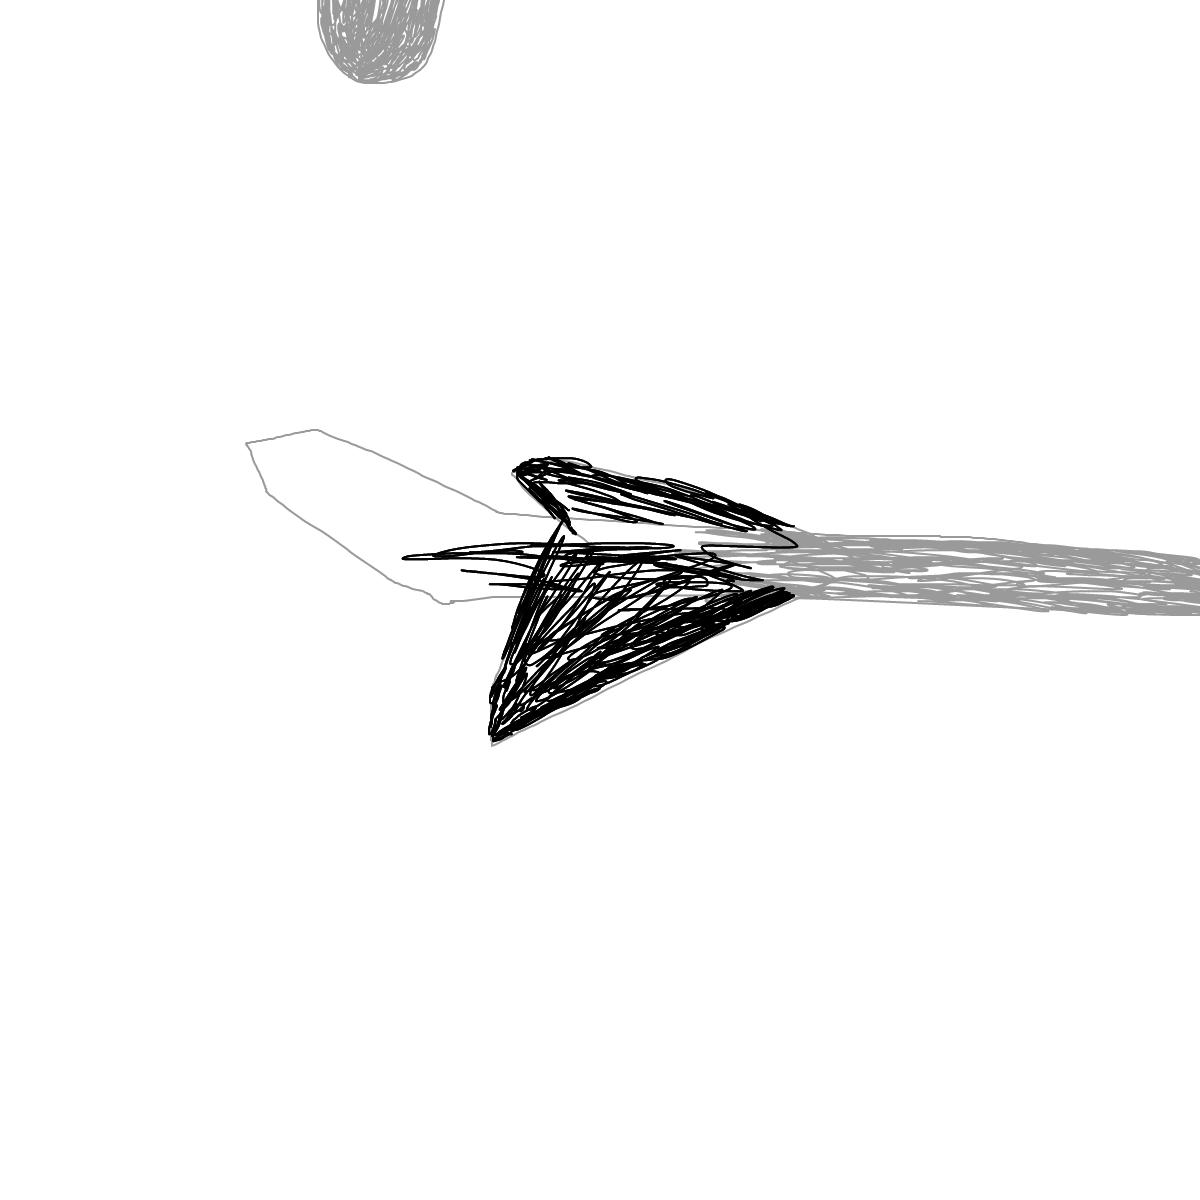 BAAAM drawing#55 lat:52.4751548767089840lng: 13.4068279266357420